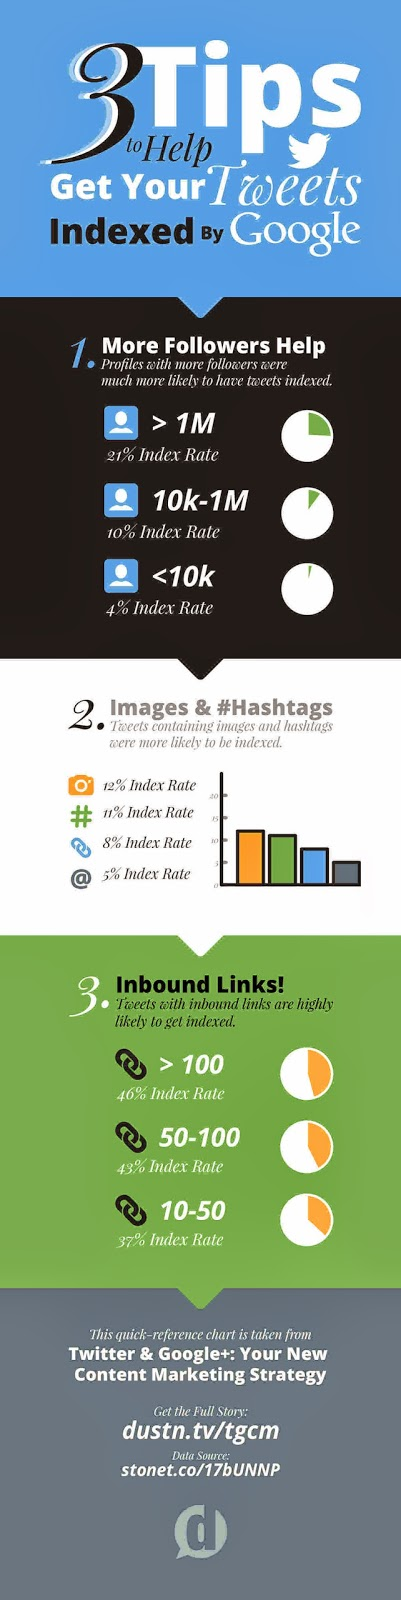 socialmedia-google-tweets-twitter-redessociales